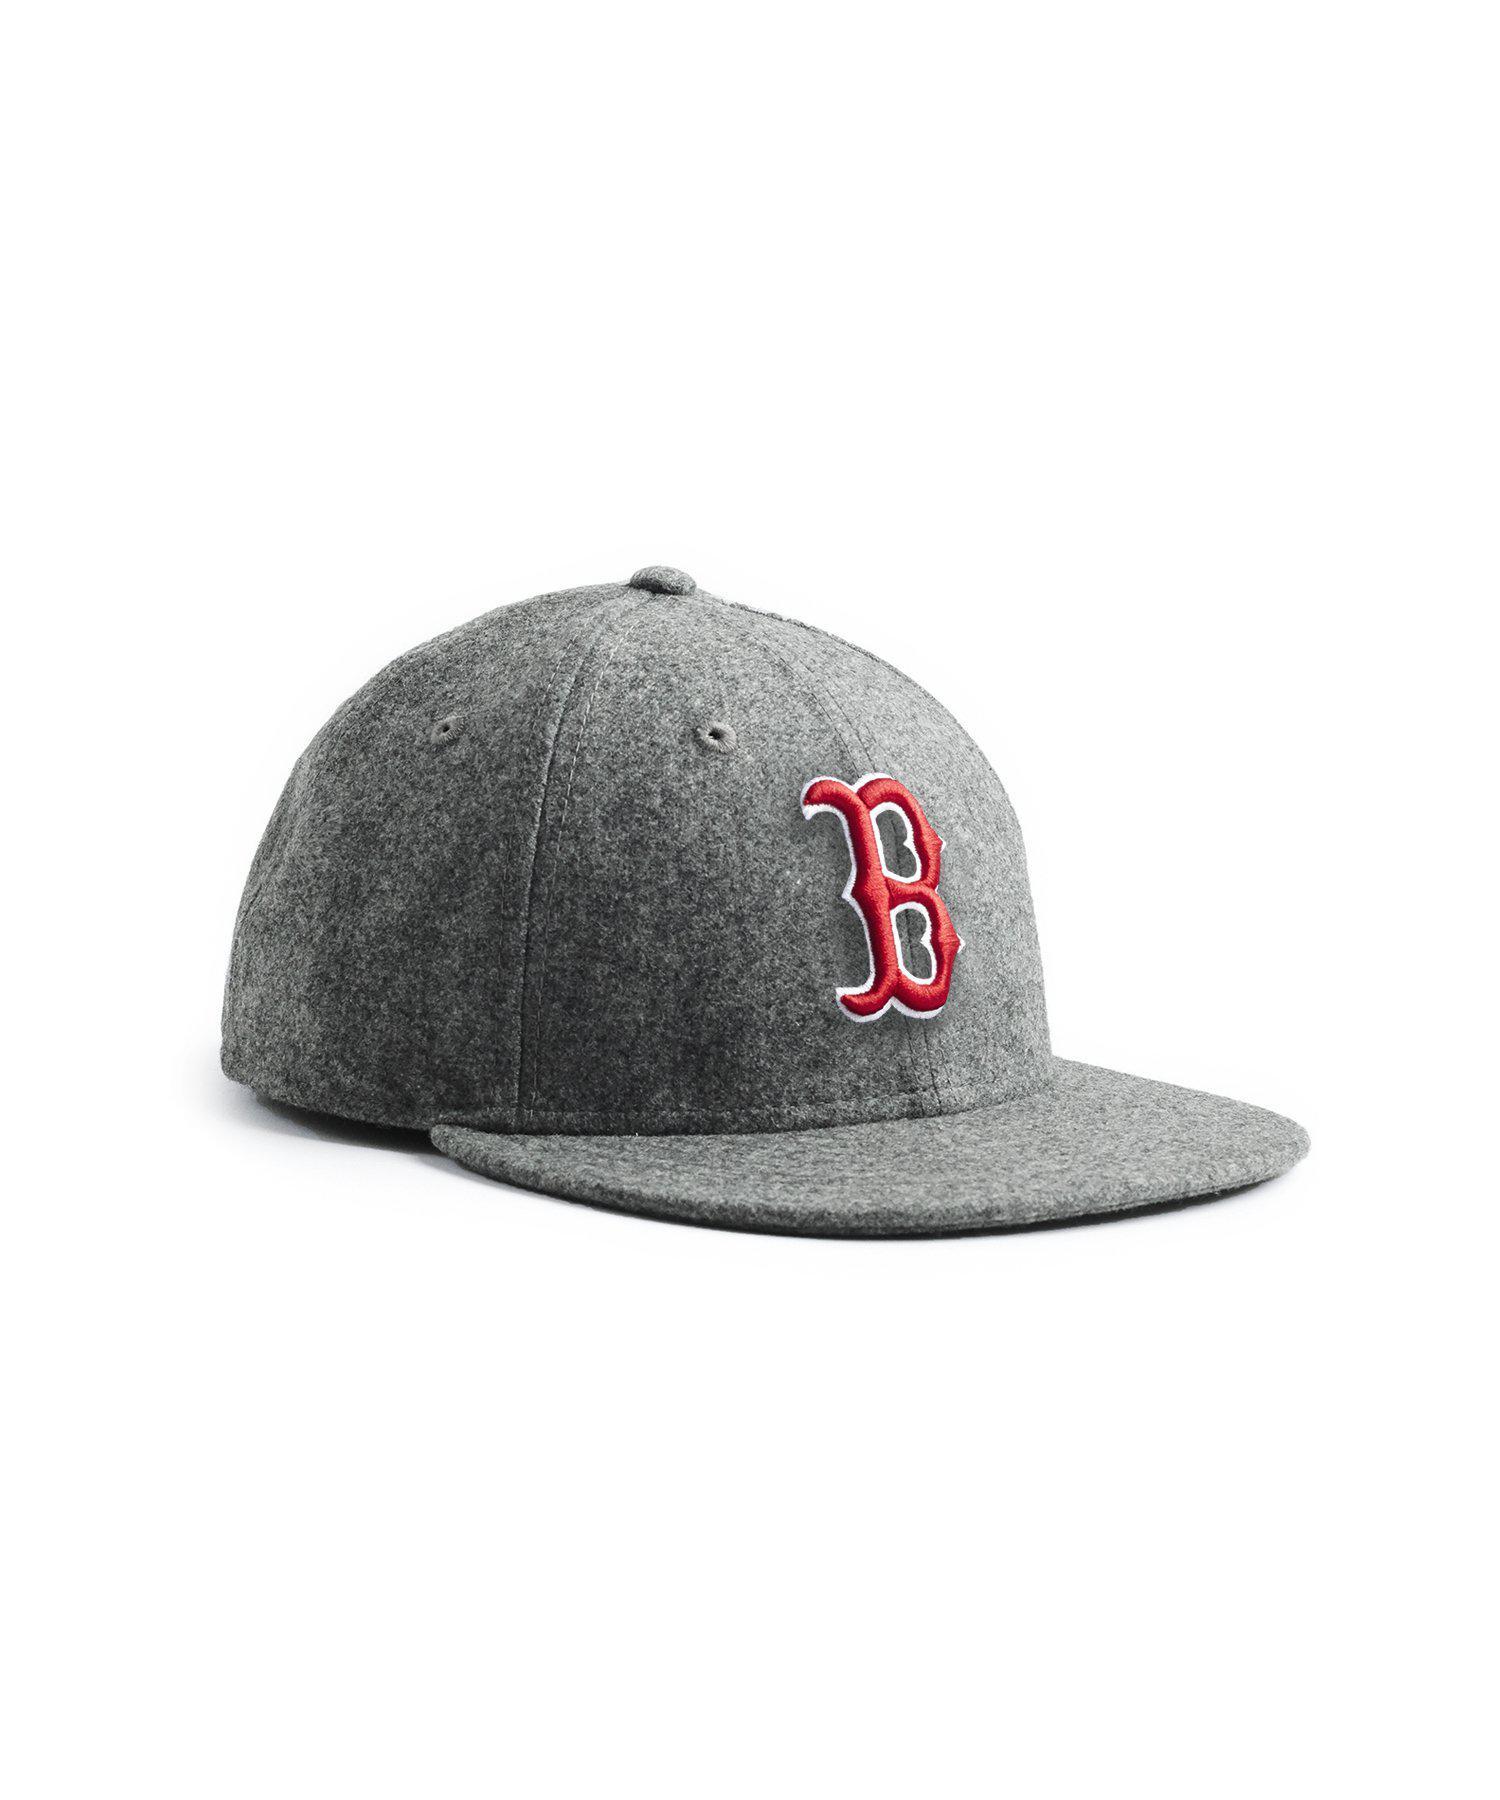 f005d356b41 NEW ERA HATS. Men s Gray Exclusive Boston Red Sox Hat In Italian Barberis  Wool Flannel